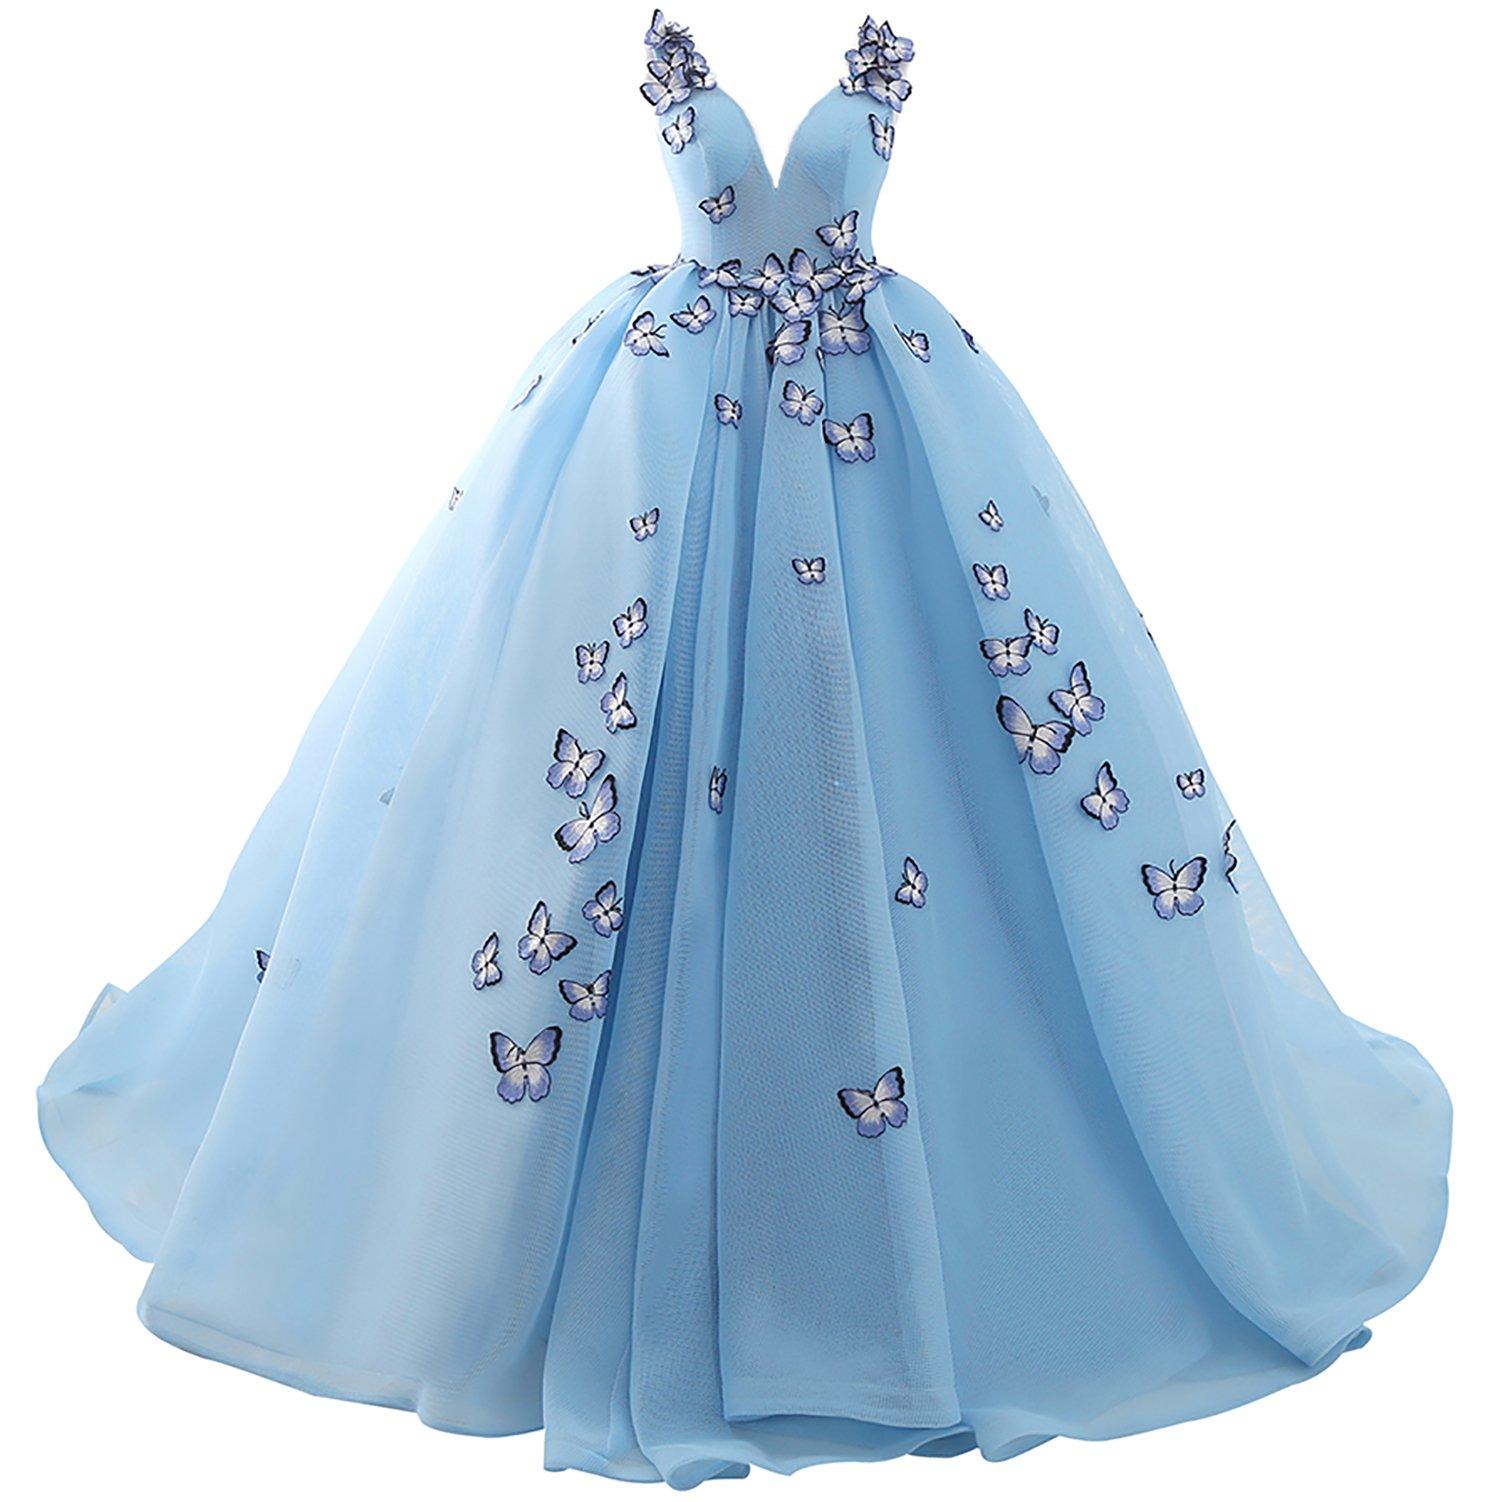 JoJoBridal Women's Butterfly A Line Long Prom Dresses Ball Gown Size 4 Sky Blue